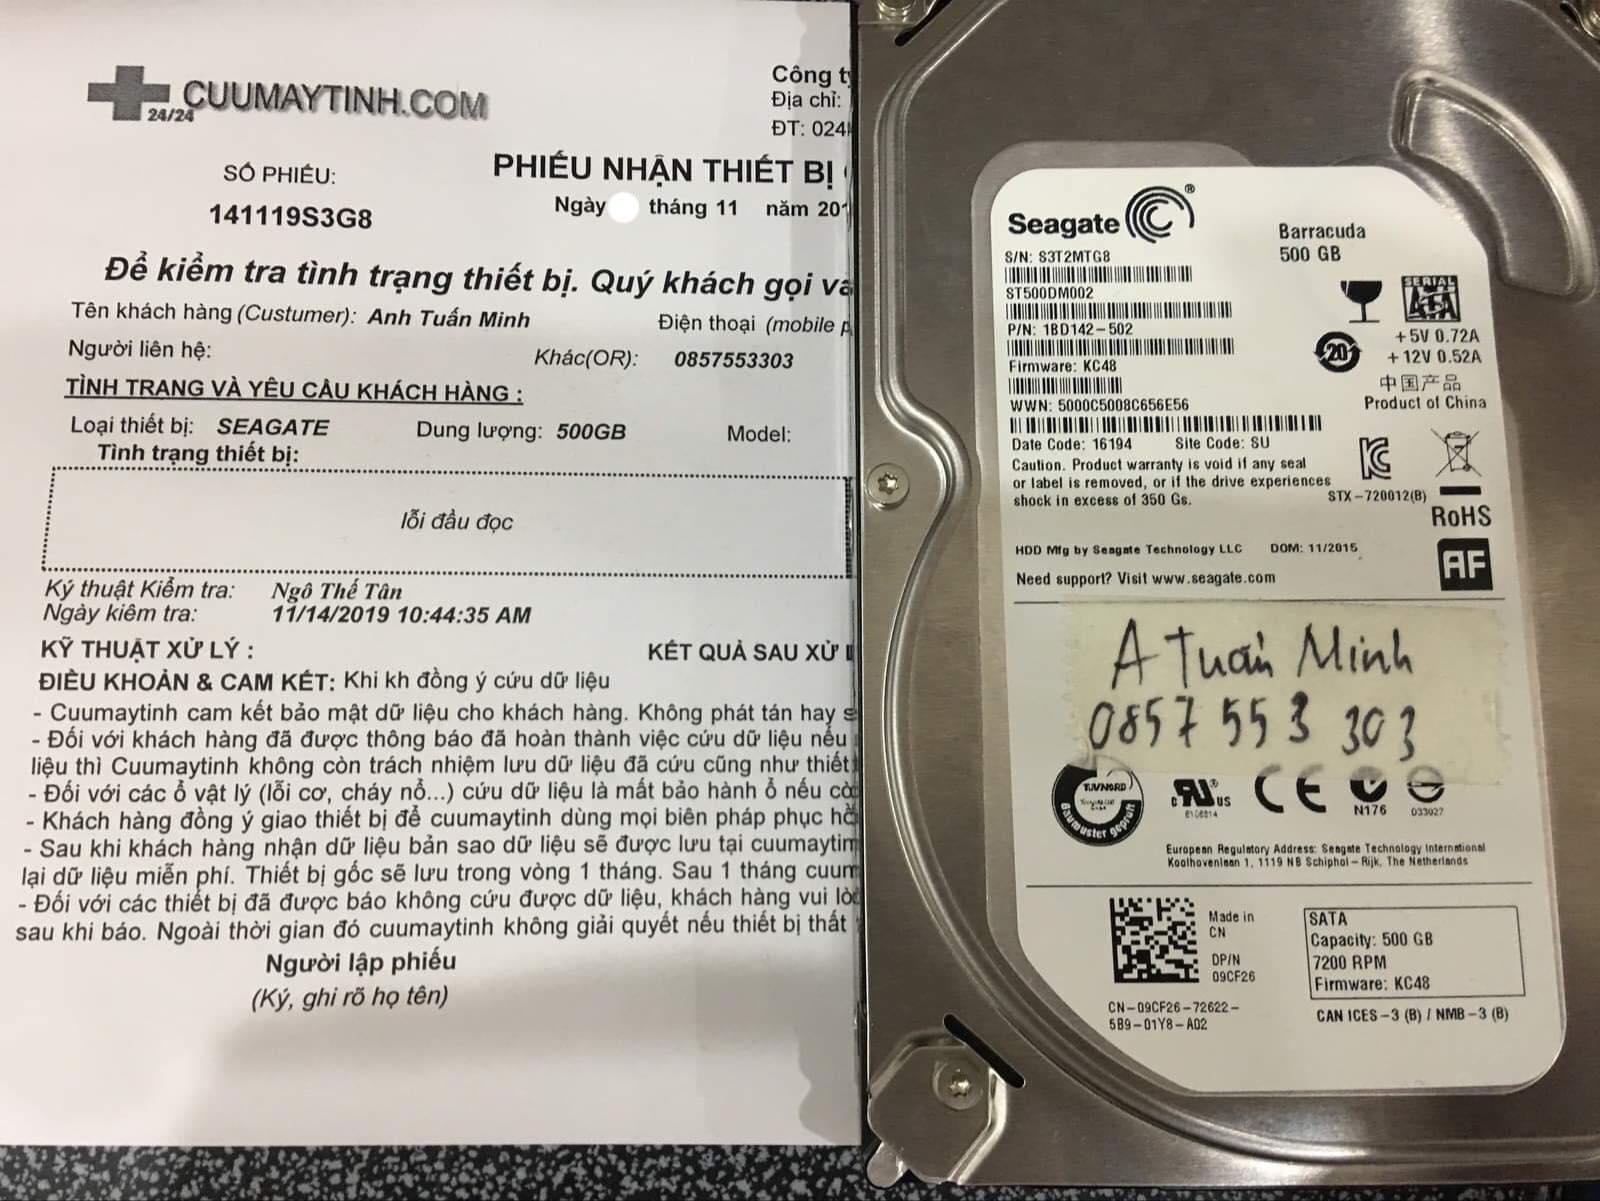 Cứu dữ liệu ổ cứng Seagate 500GB lỗi đầu đọc 19/11/2019 - cuumaytinh